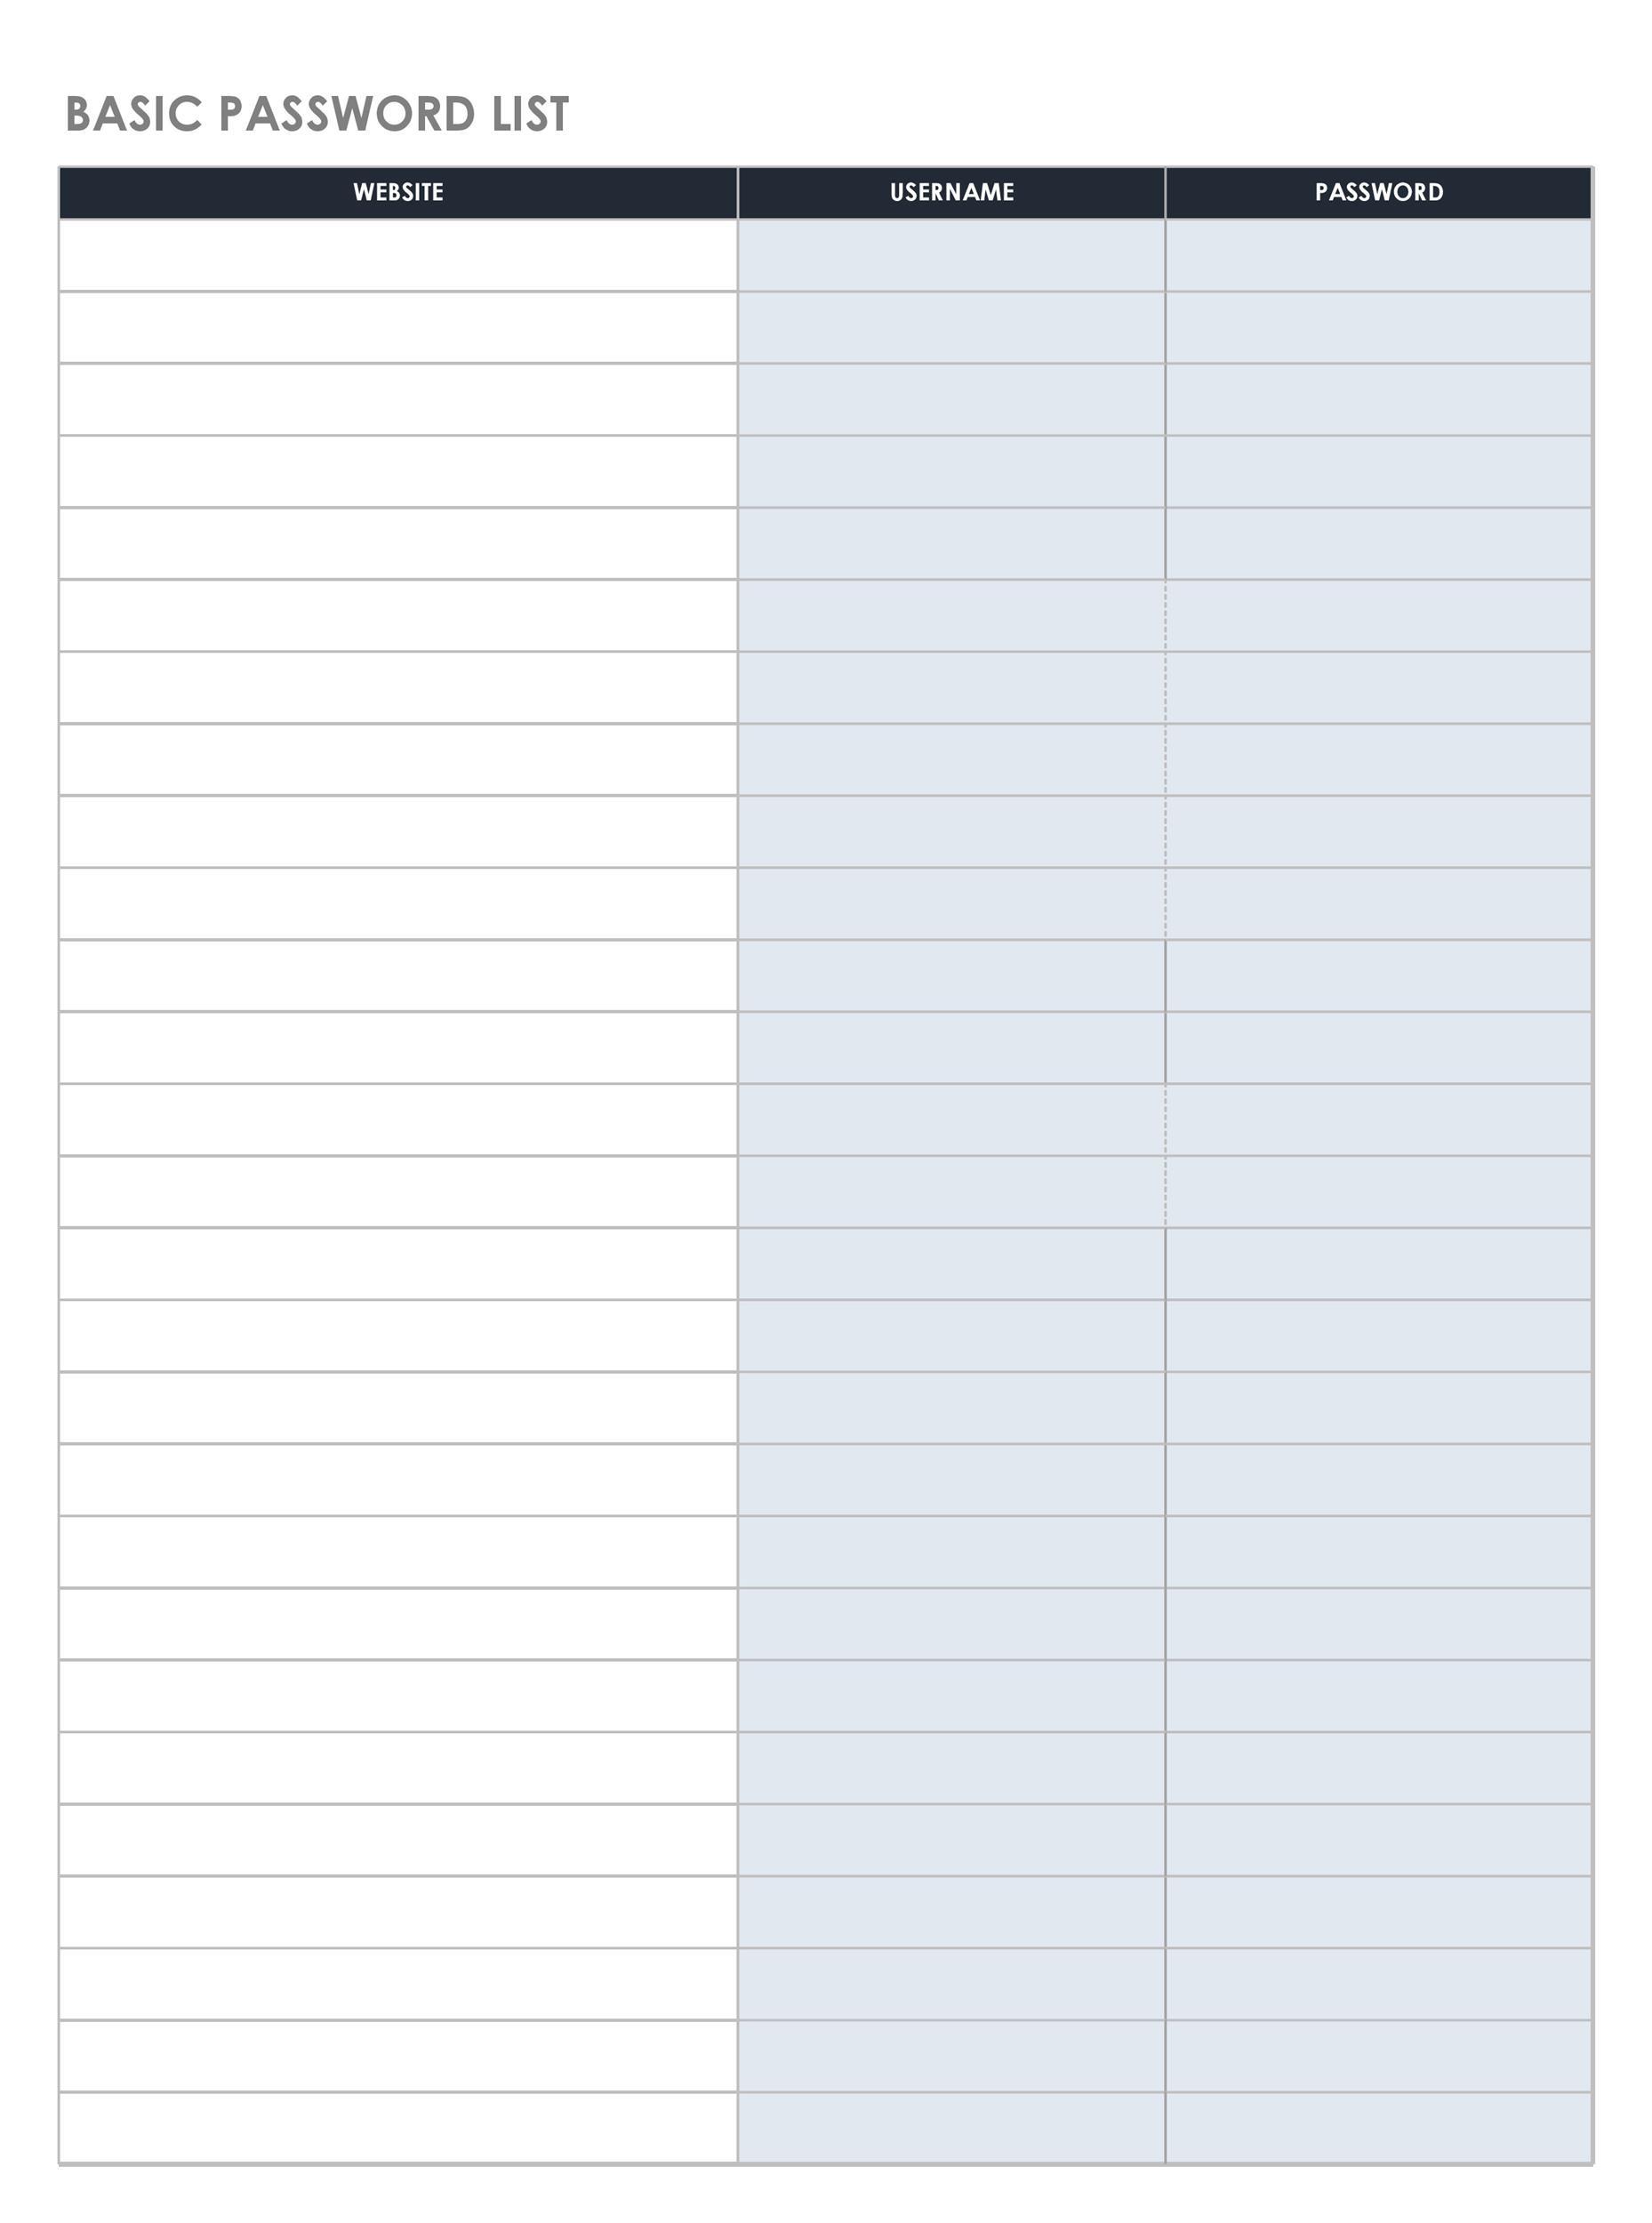 Free password list template 27